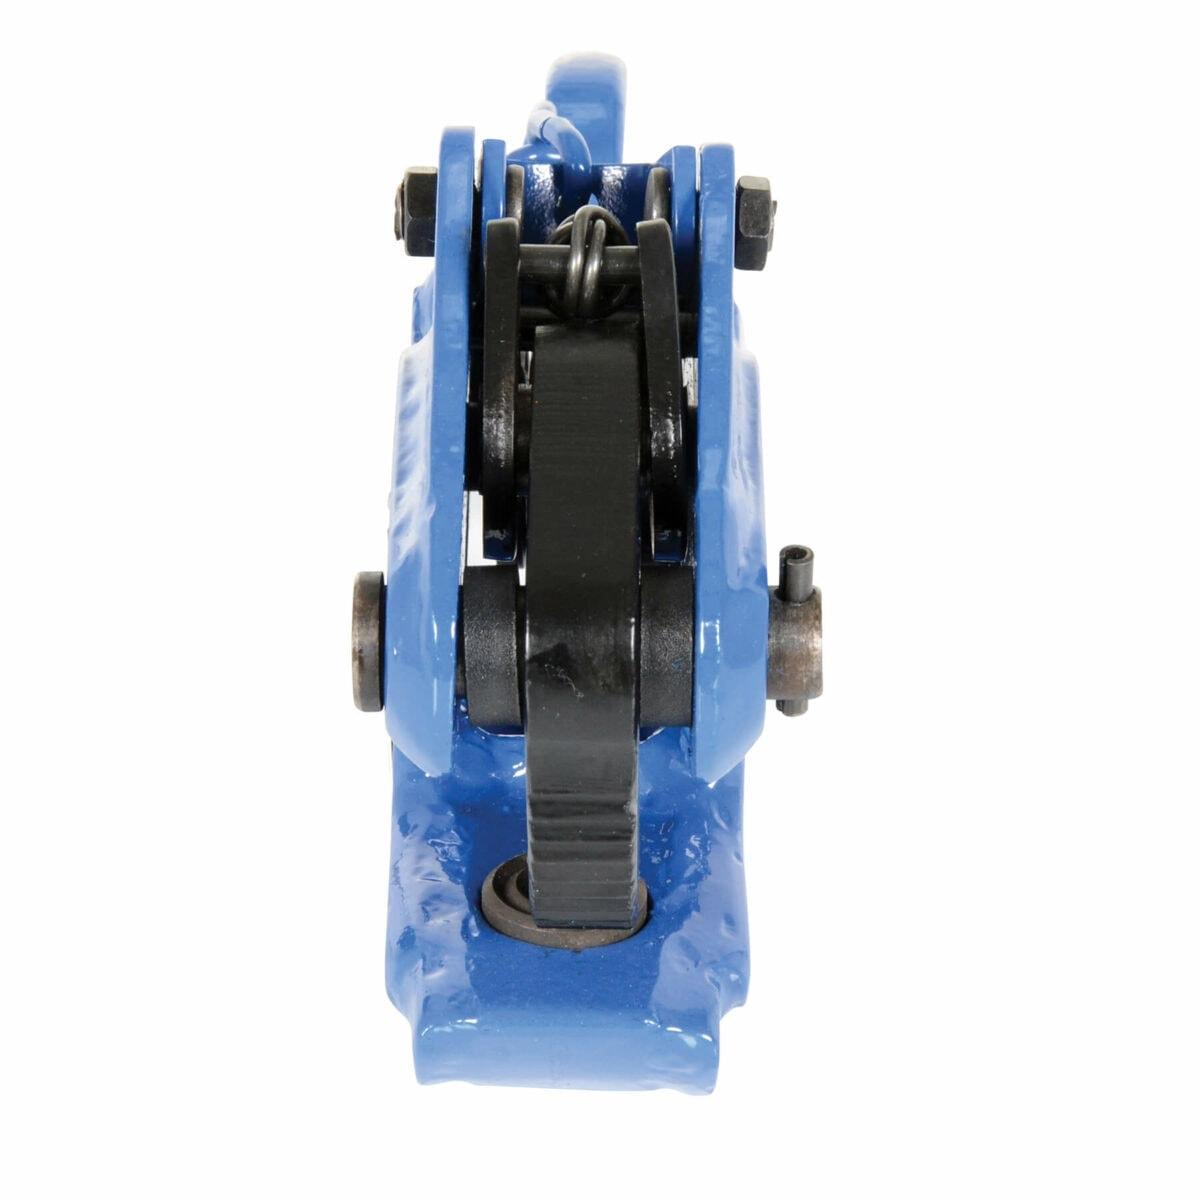 Vestil Vertical Positive Locking Plate Clamp C